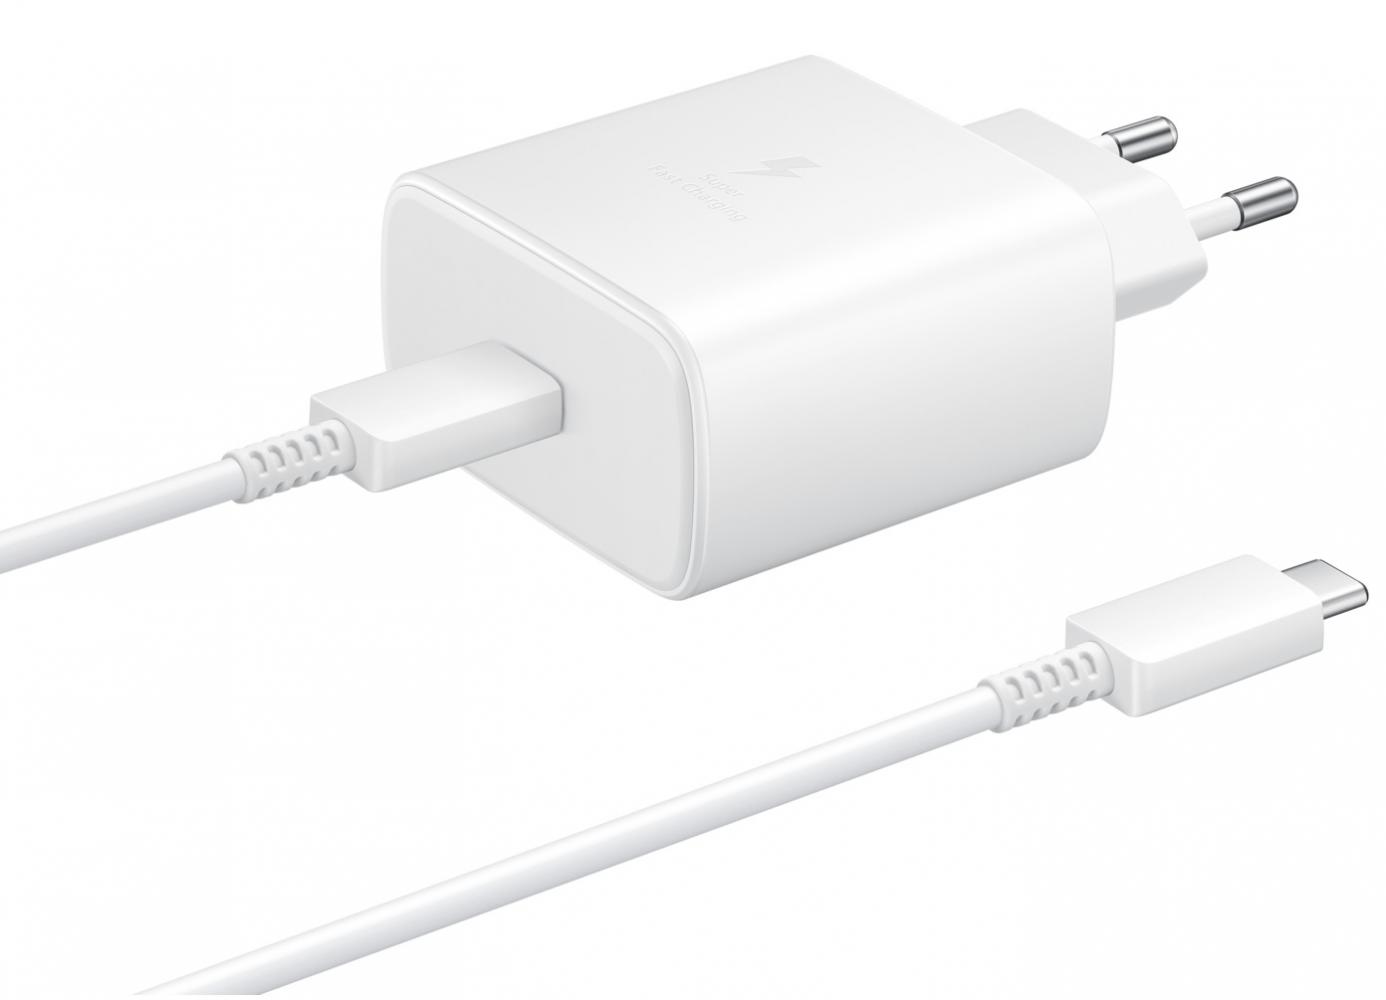 Купить Зарядные устройства, Сетевое зарядное устройство Samsung Fast Charging Type-C 45W (EP-TA845XWEGRU) White